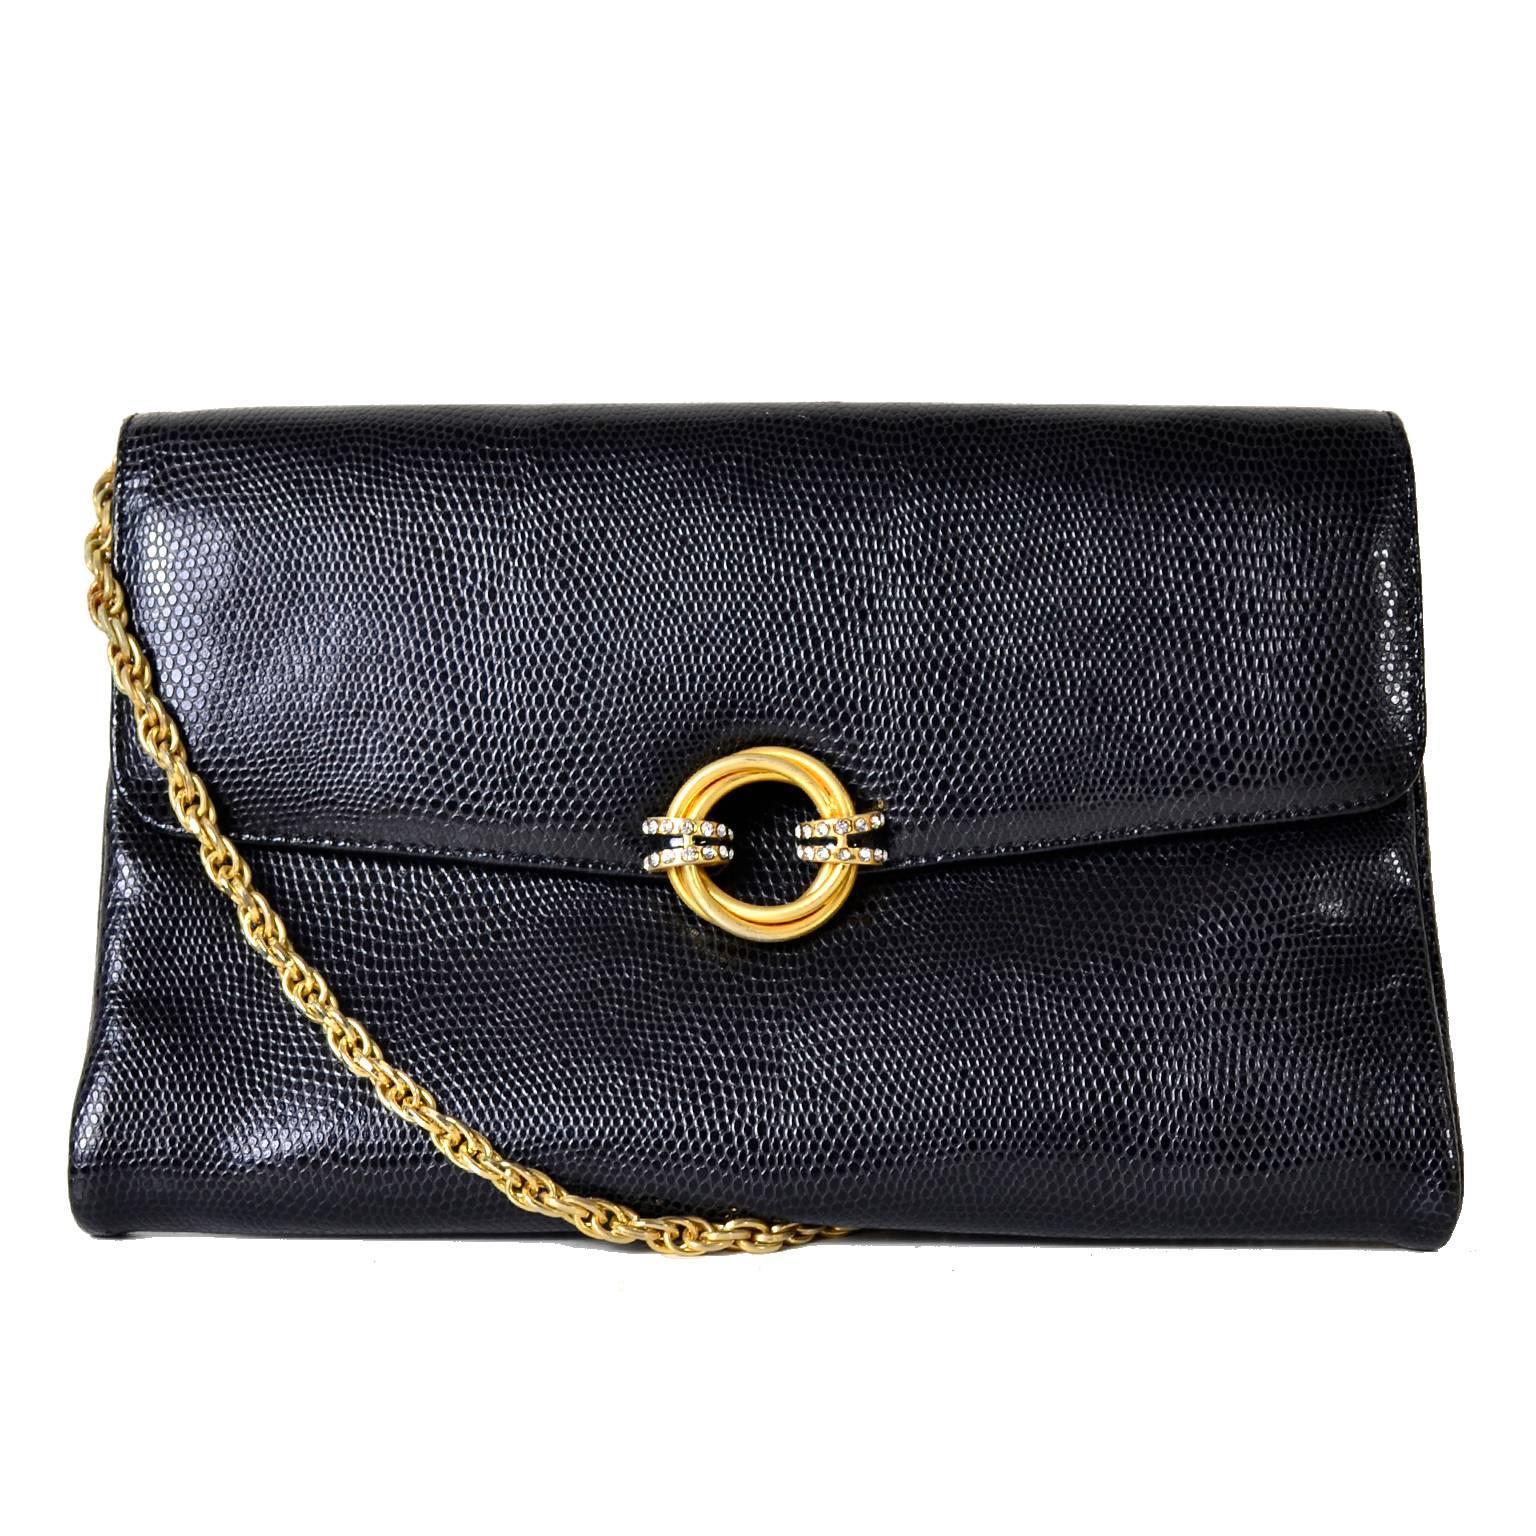 Rodo Italy Vintage Reptile Embossed Black Leather Handbag W/ Rhinestone Clasp HUMCm33